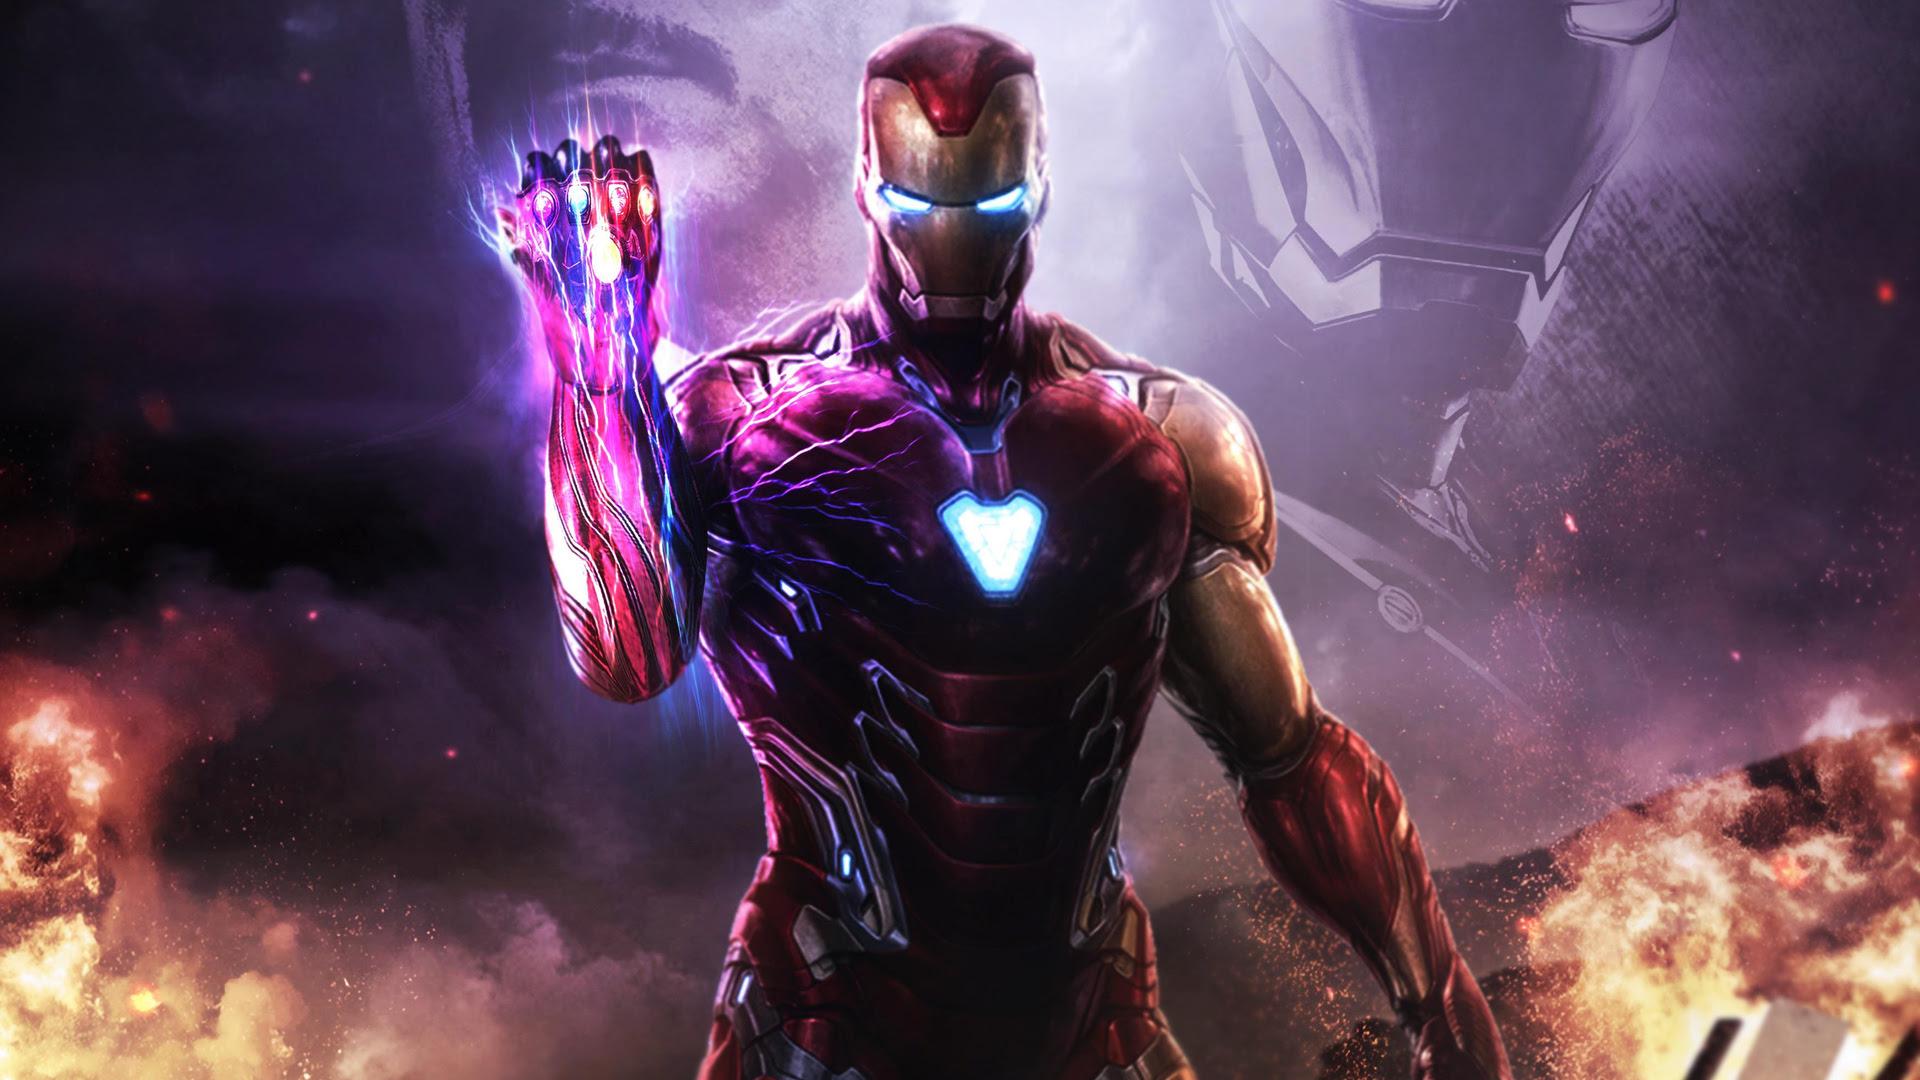 1920x1080 Iron Man Infinity Gauntlet 4k Laptop Full HD 1080P HD 4k Wallpapers, Images ...